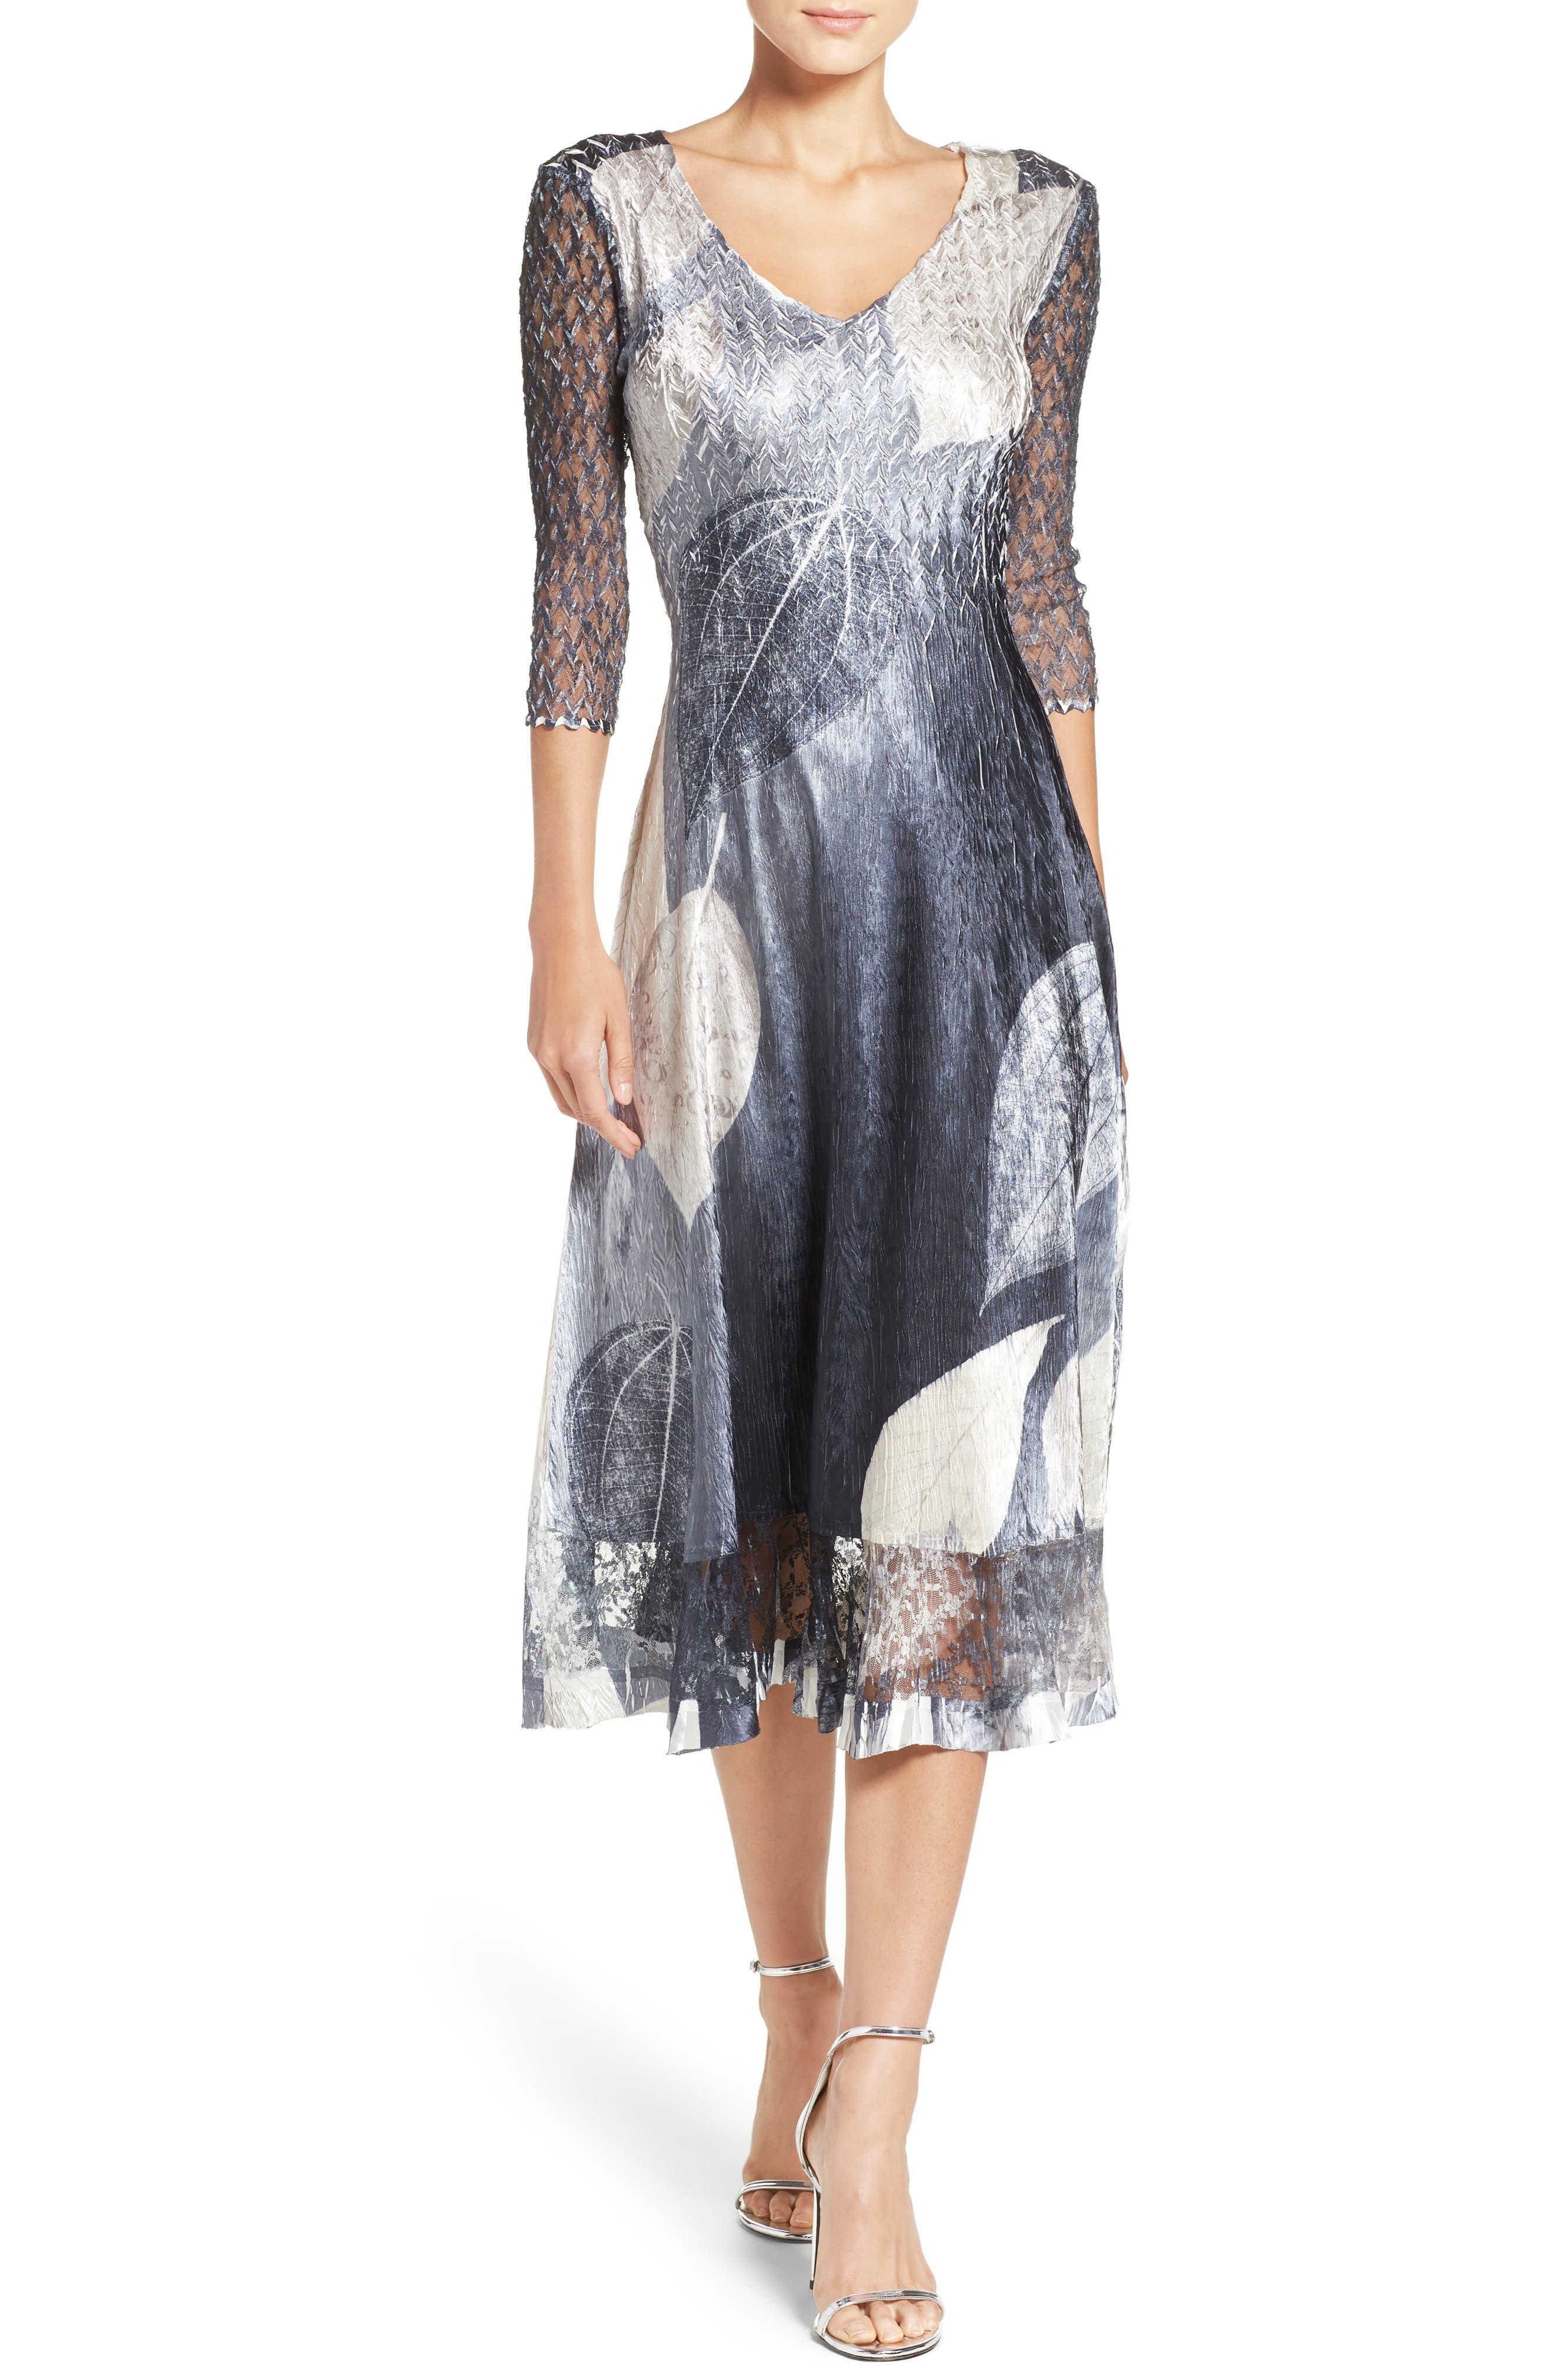 Alternate Image 1 Selected - Komarov Print Charmeuse & Lace A-Line Dress (Regular & Petite)